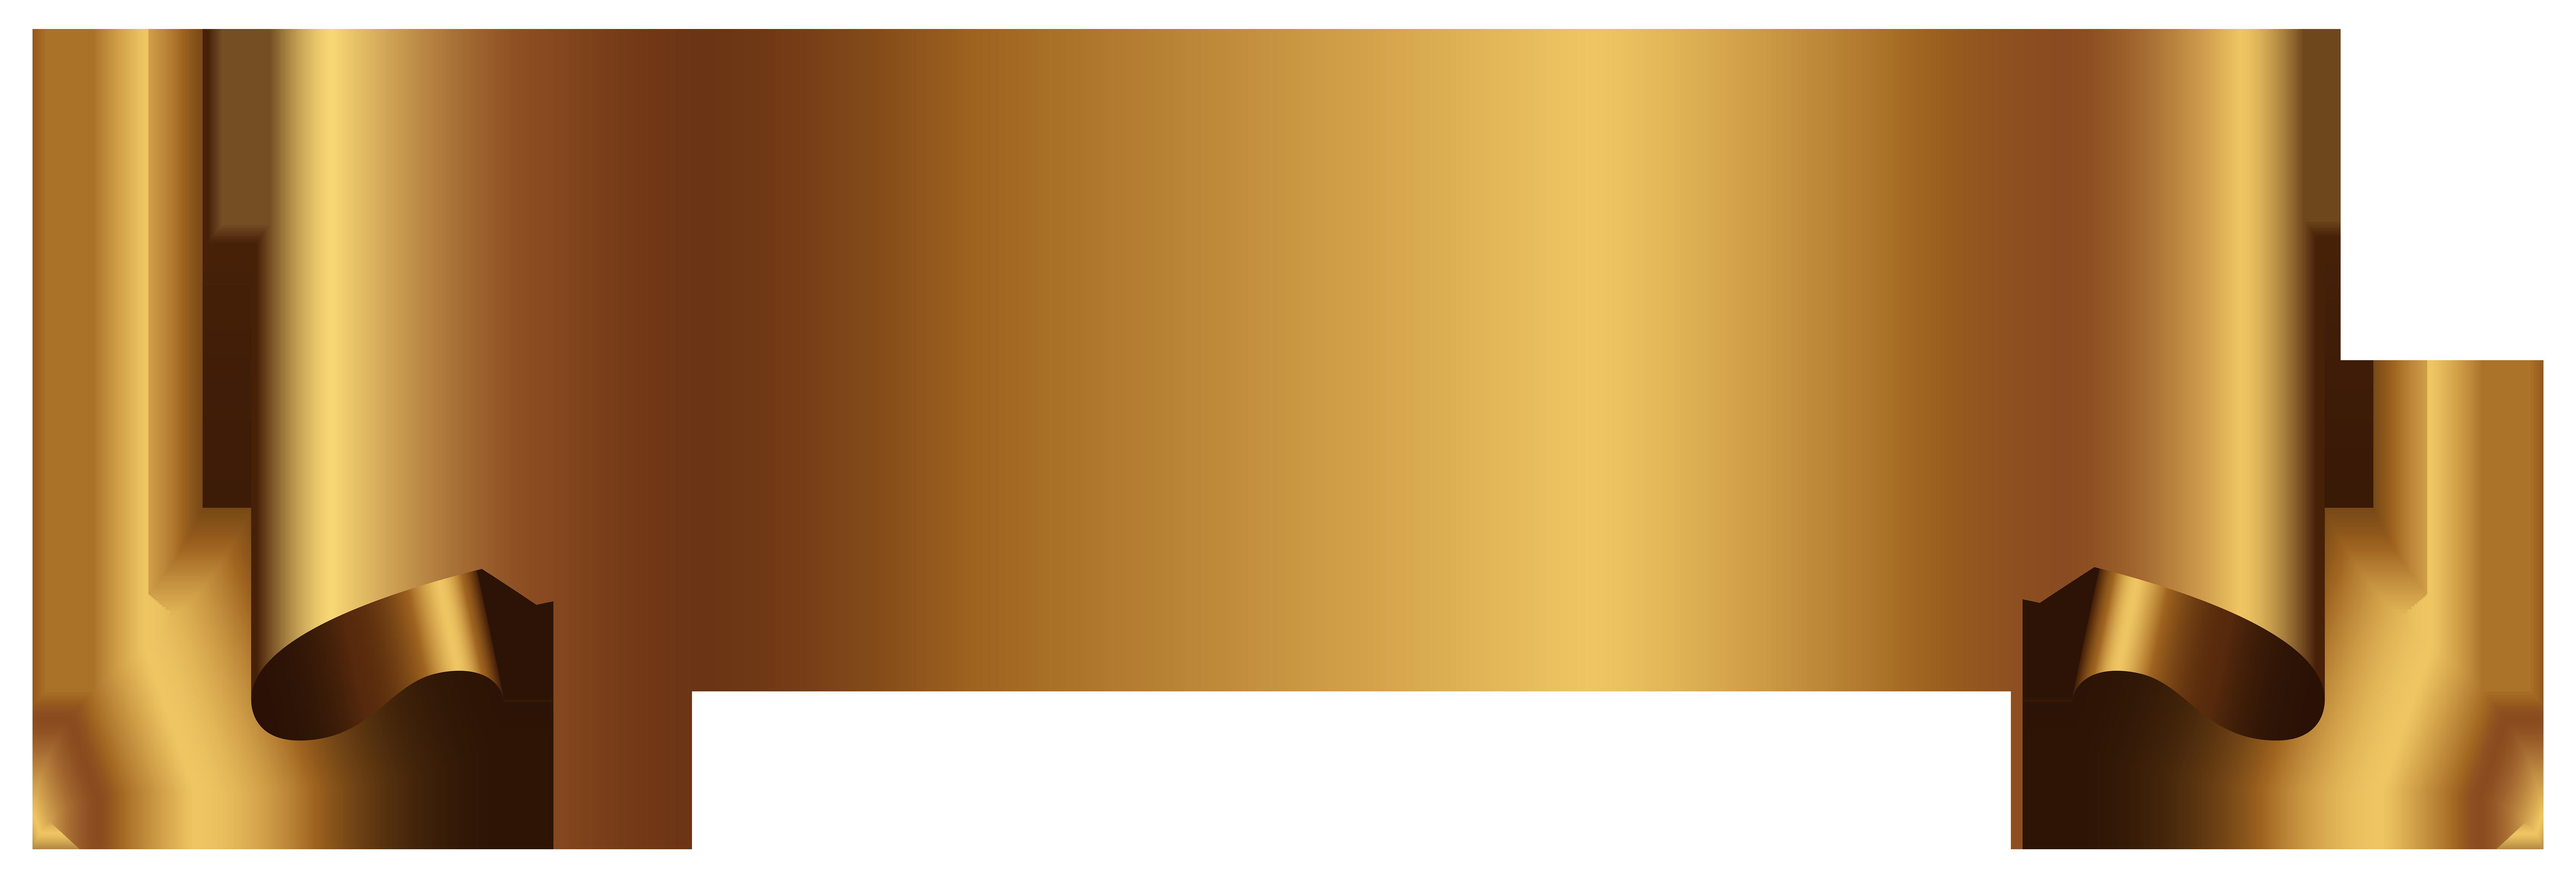 Clipart banner. Golden transparent png clip